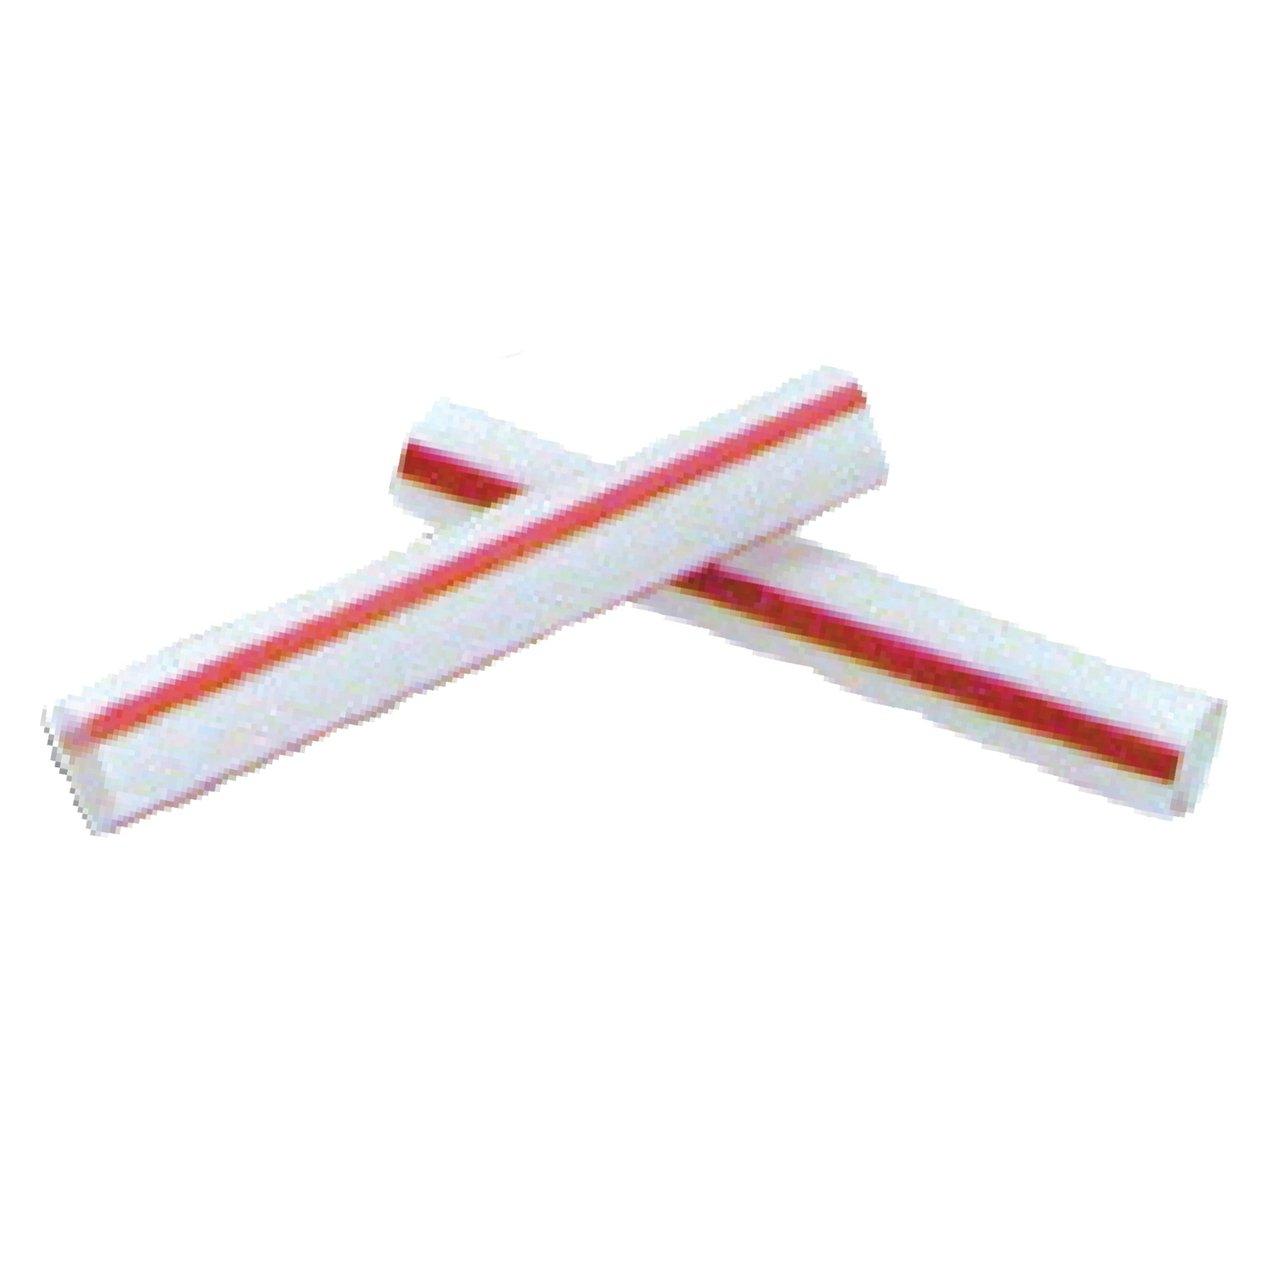 Vista VIS-802020 Straw Aspirator Kit (Pack of 200)